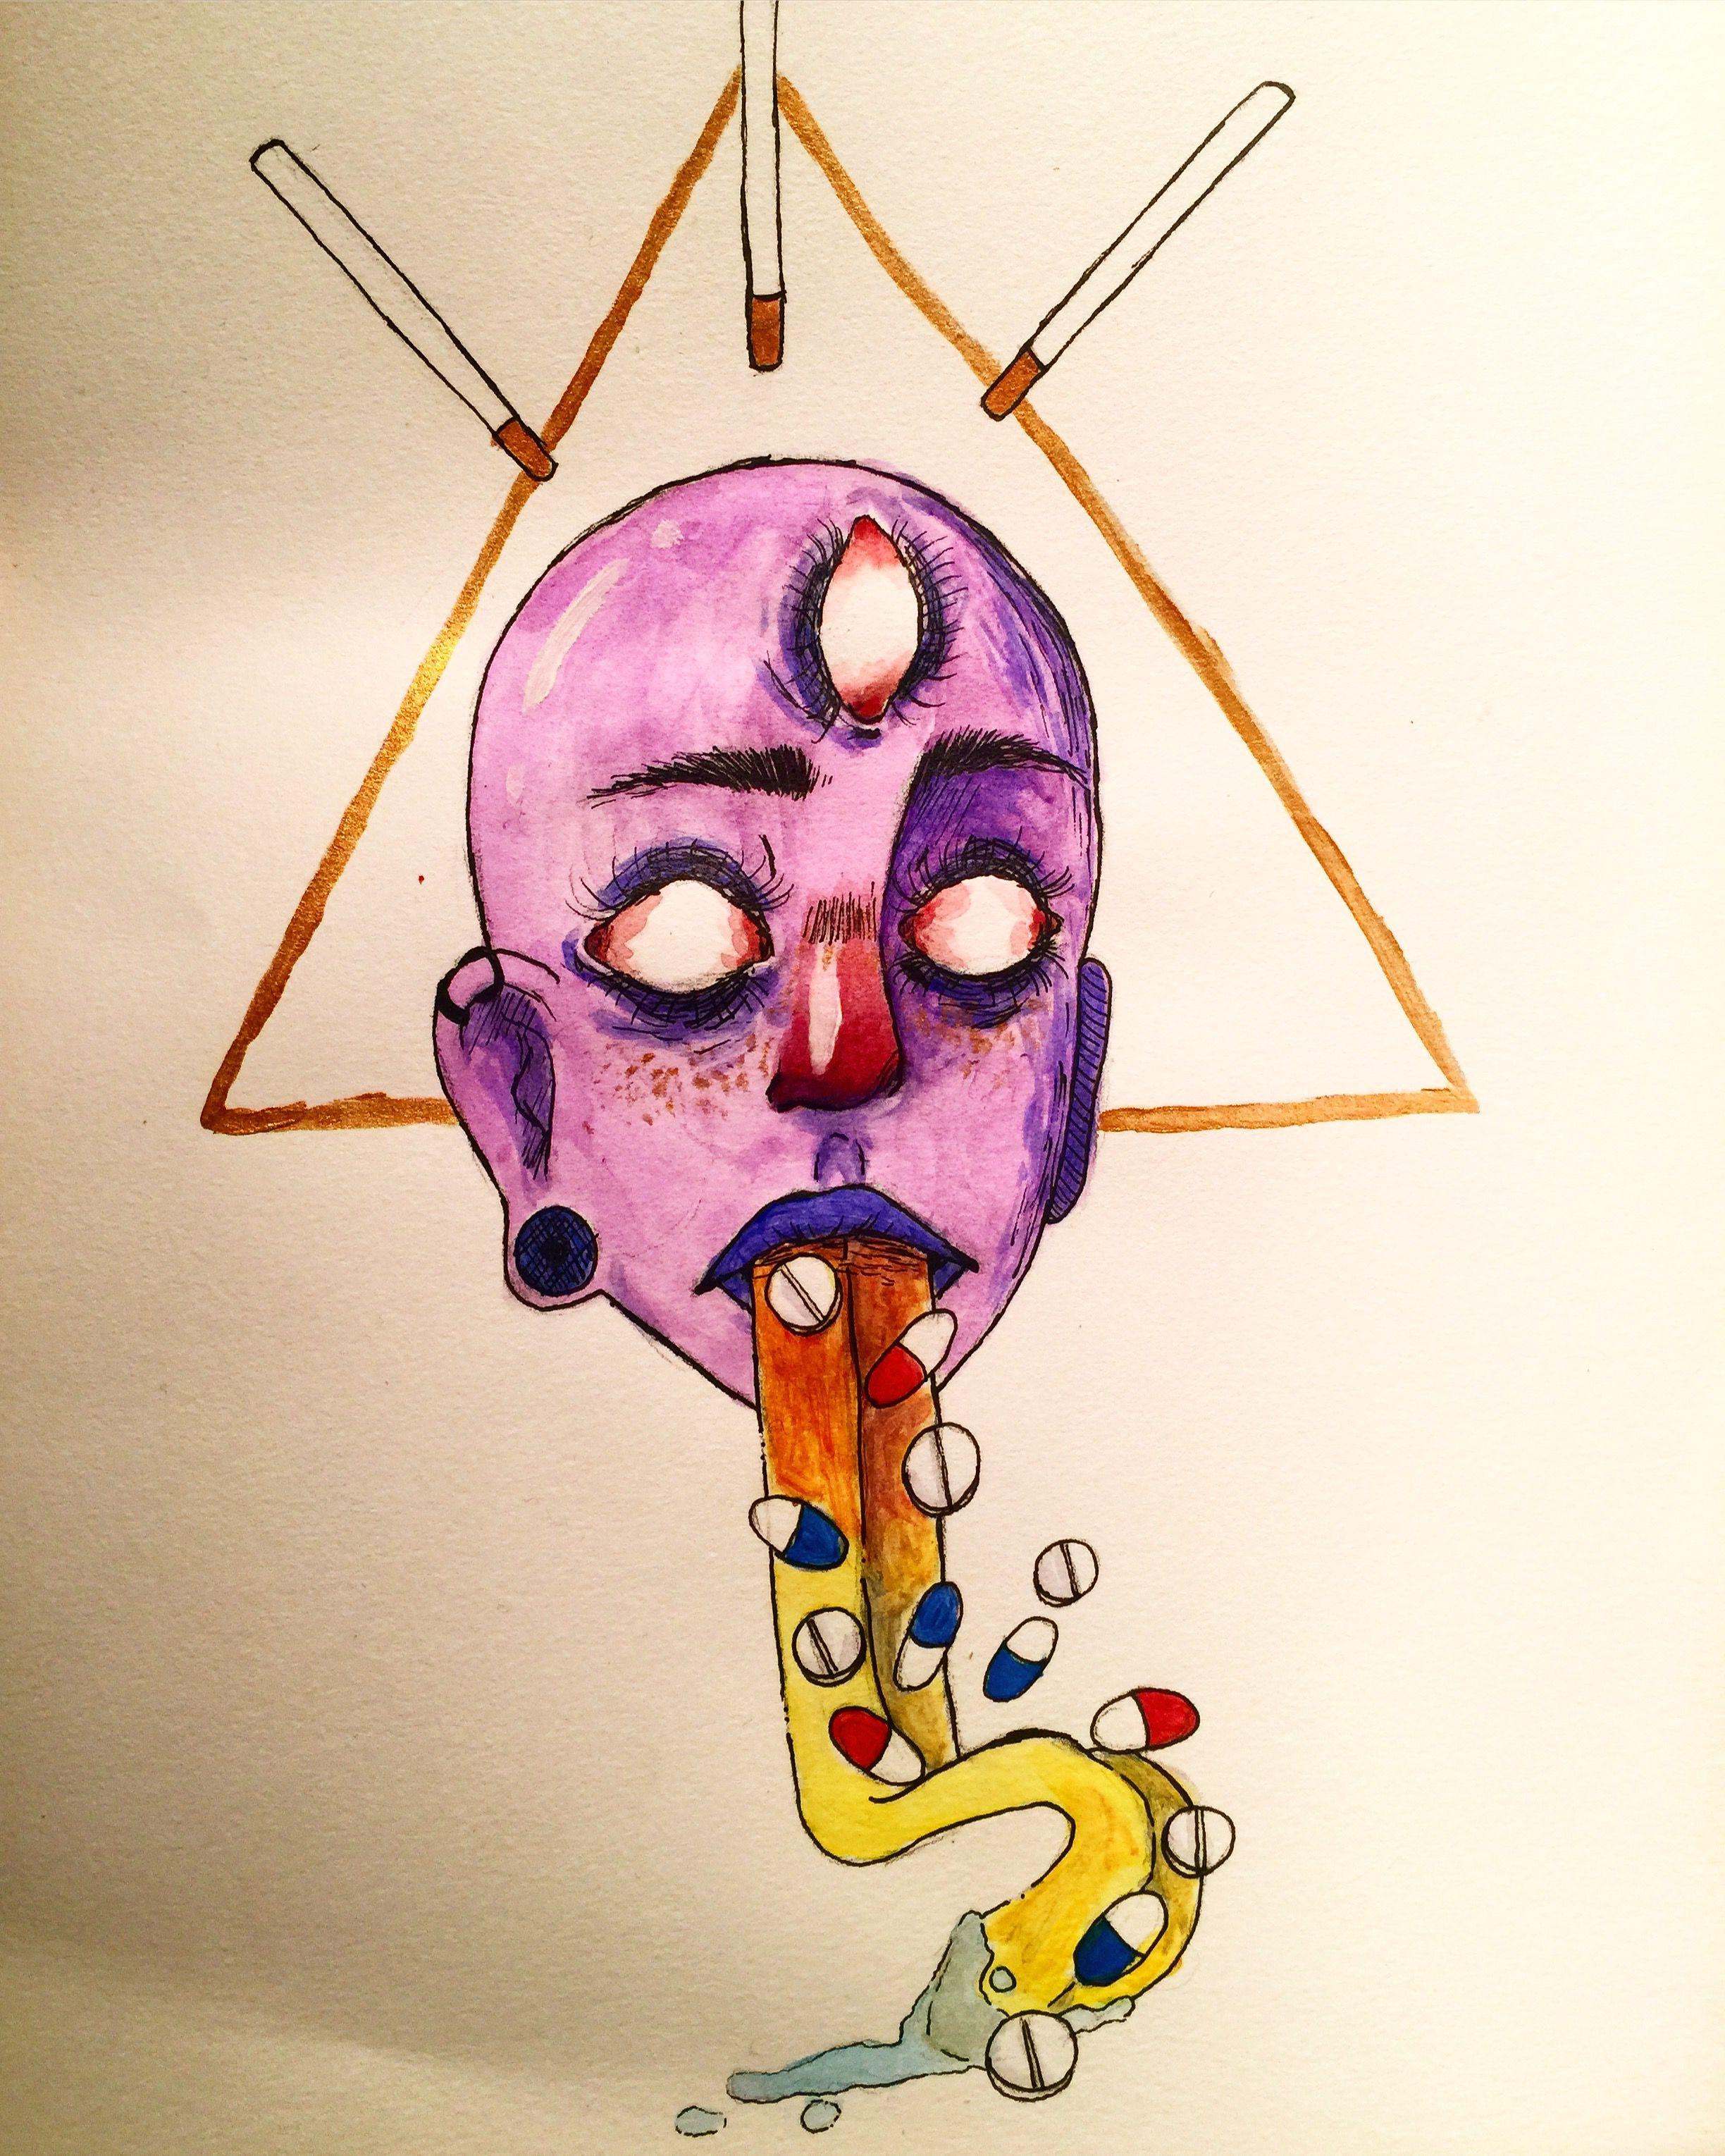 Pin on My art